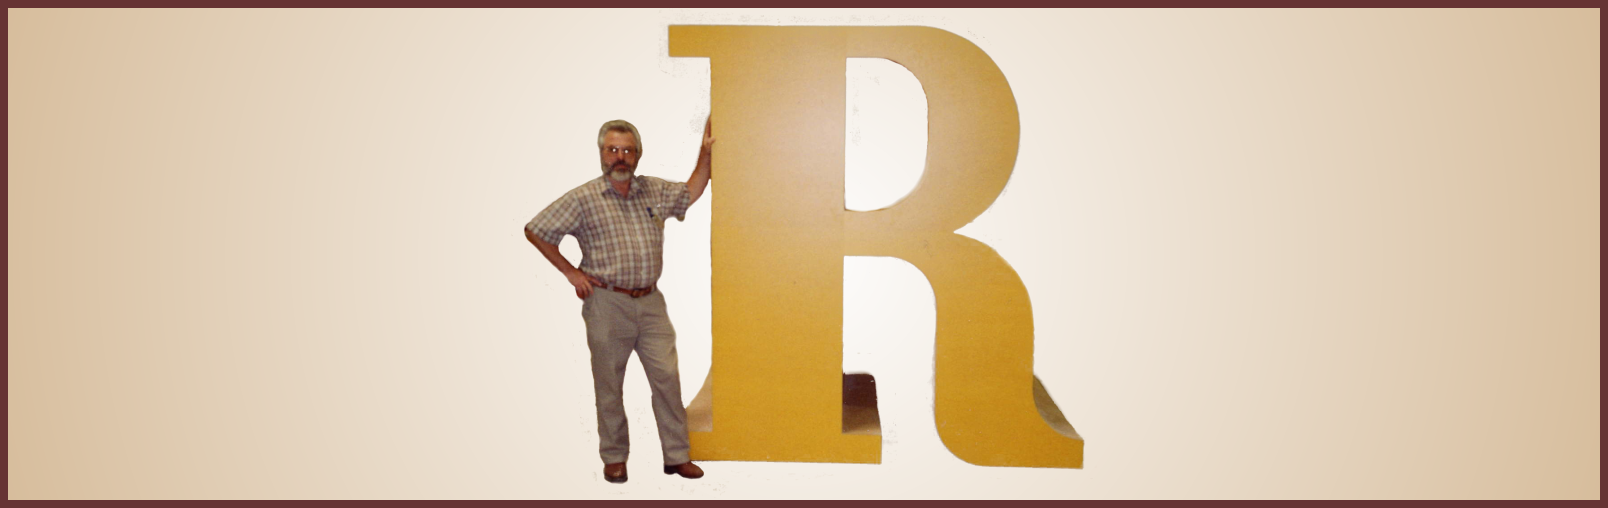 Me-with-R-Slideshow-2